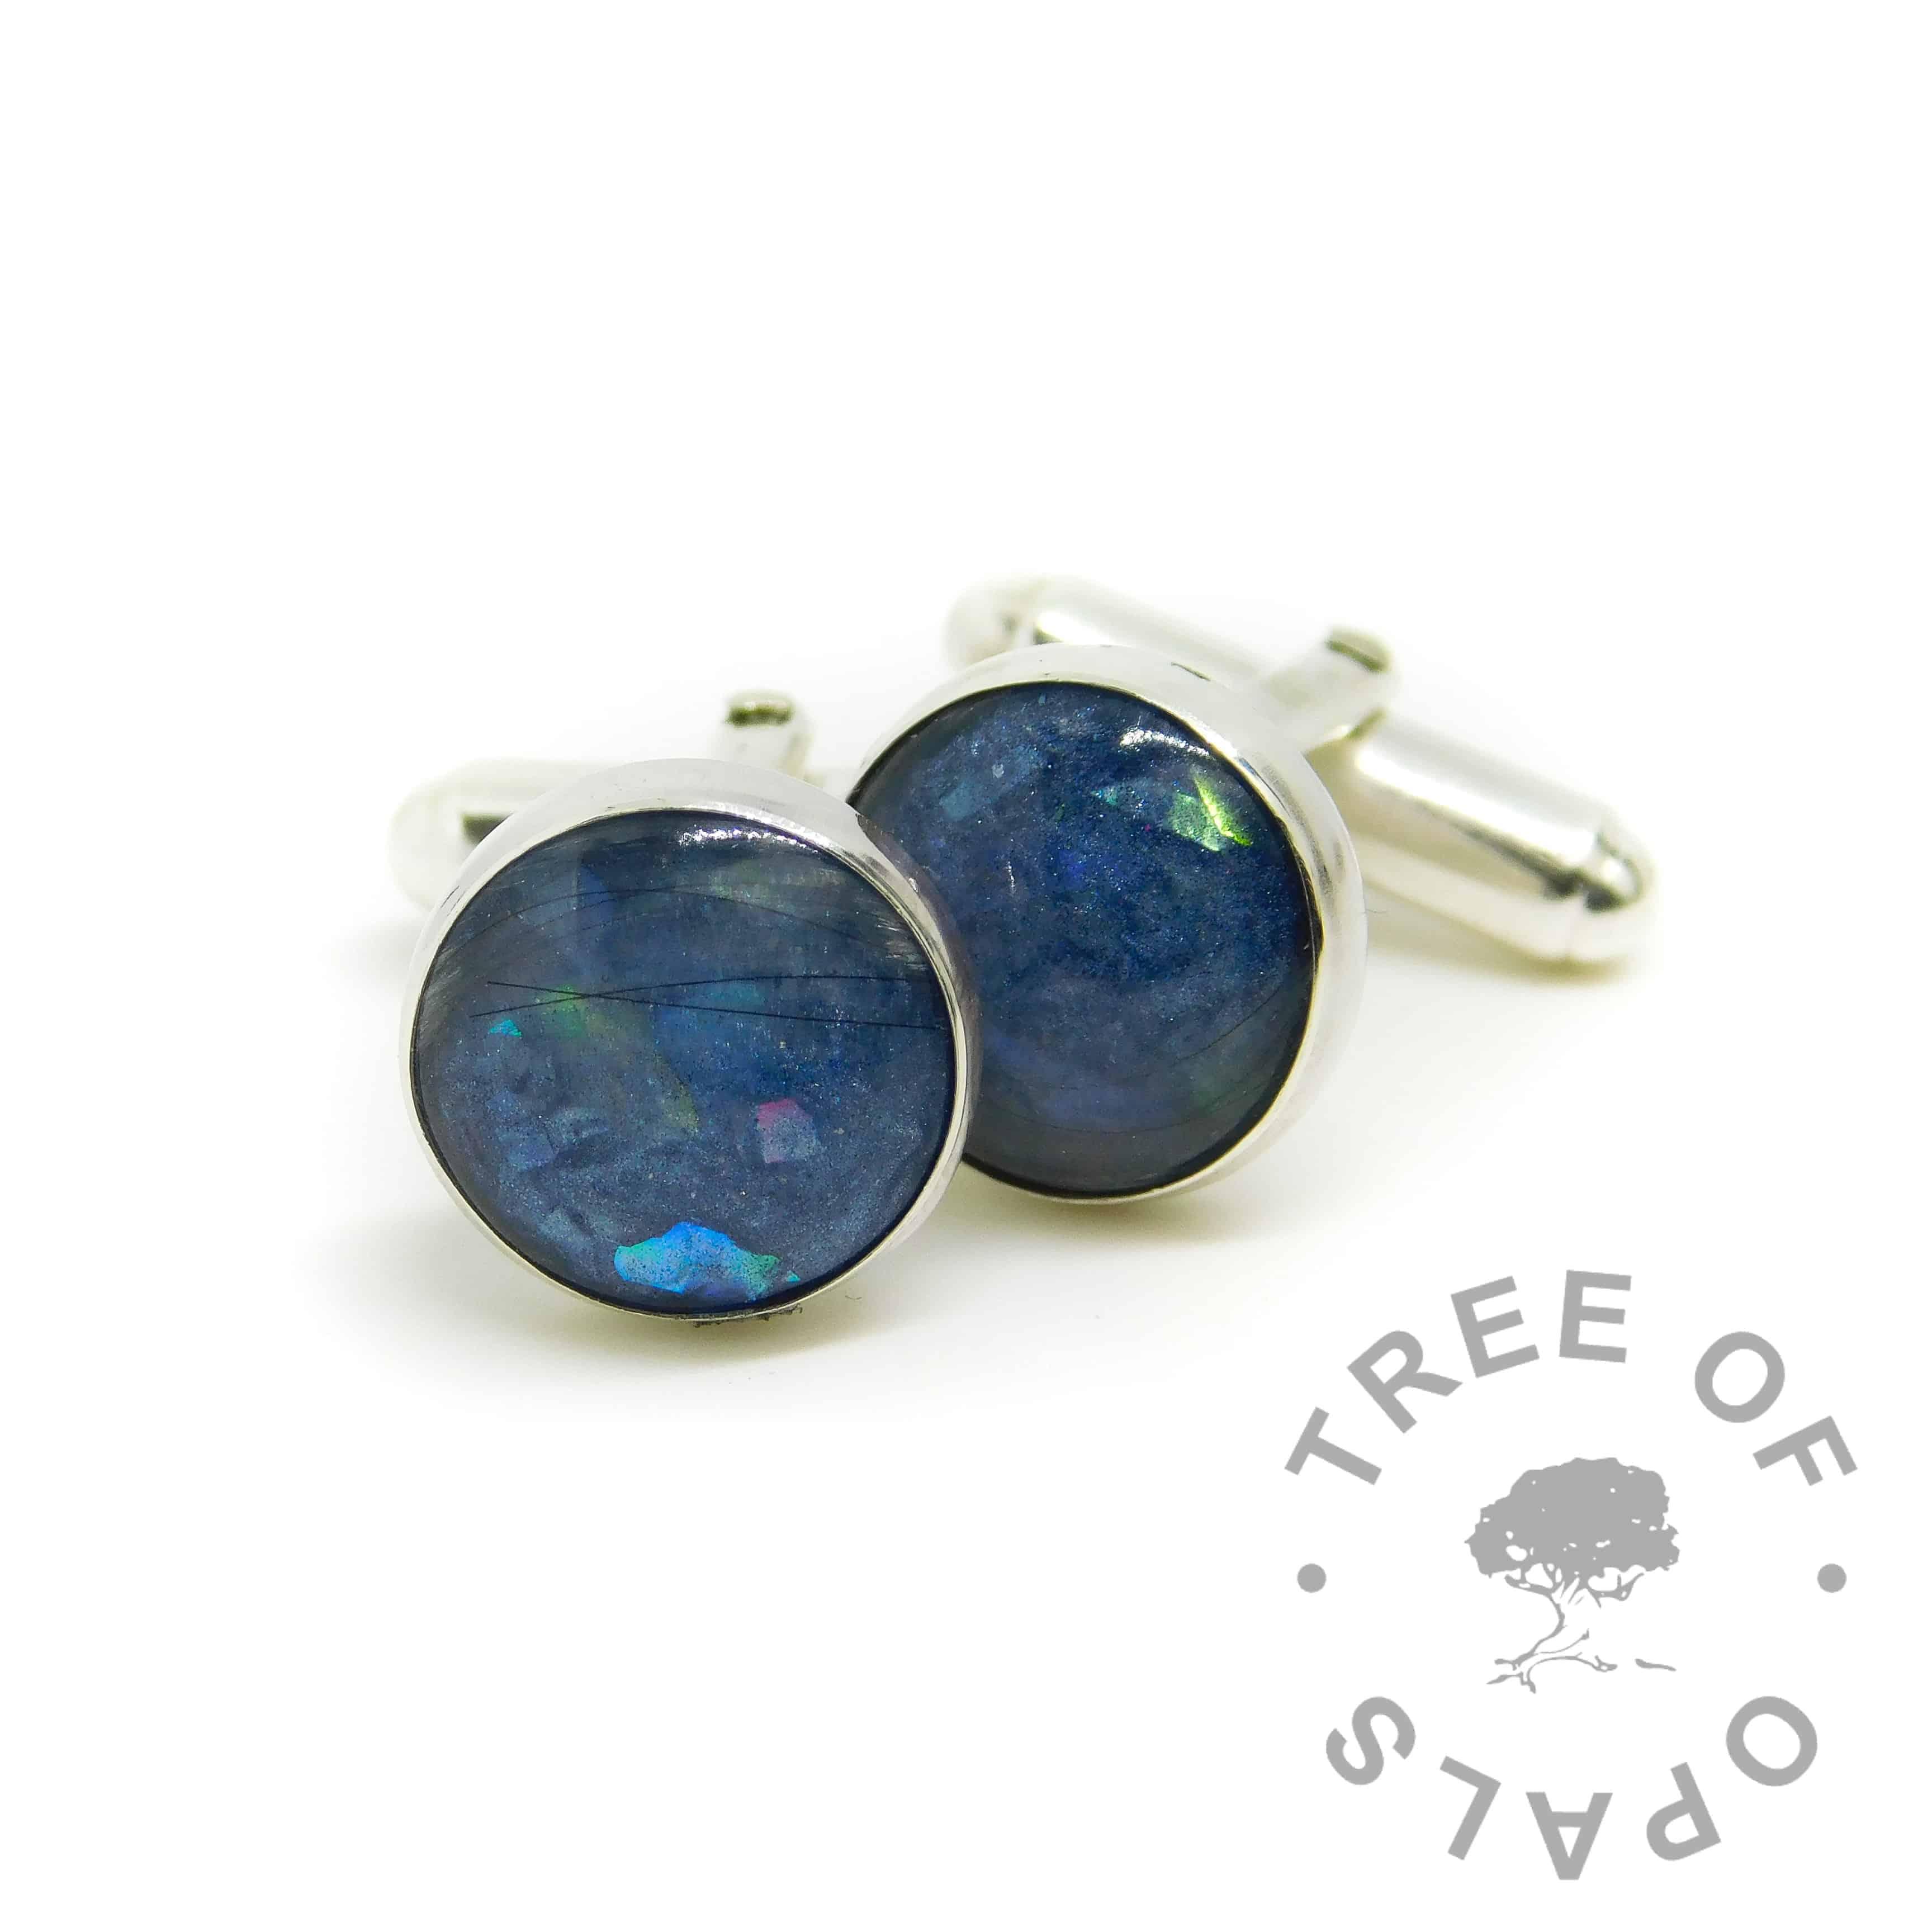 lock of hair cufflinks with Aegean Blue Resin Sparkle Mix, white/clear see-through hair